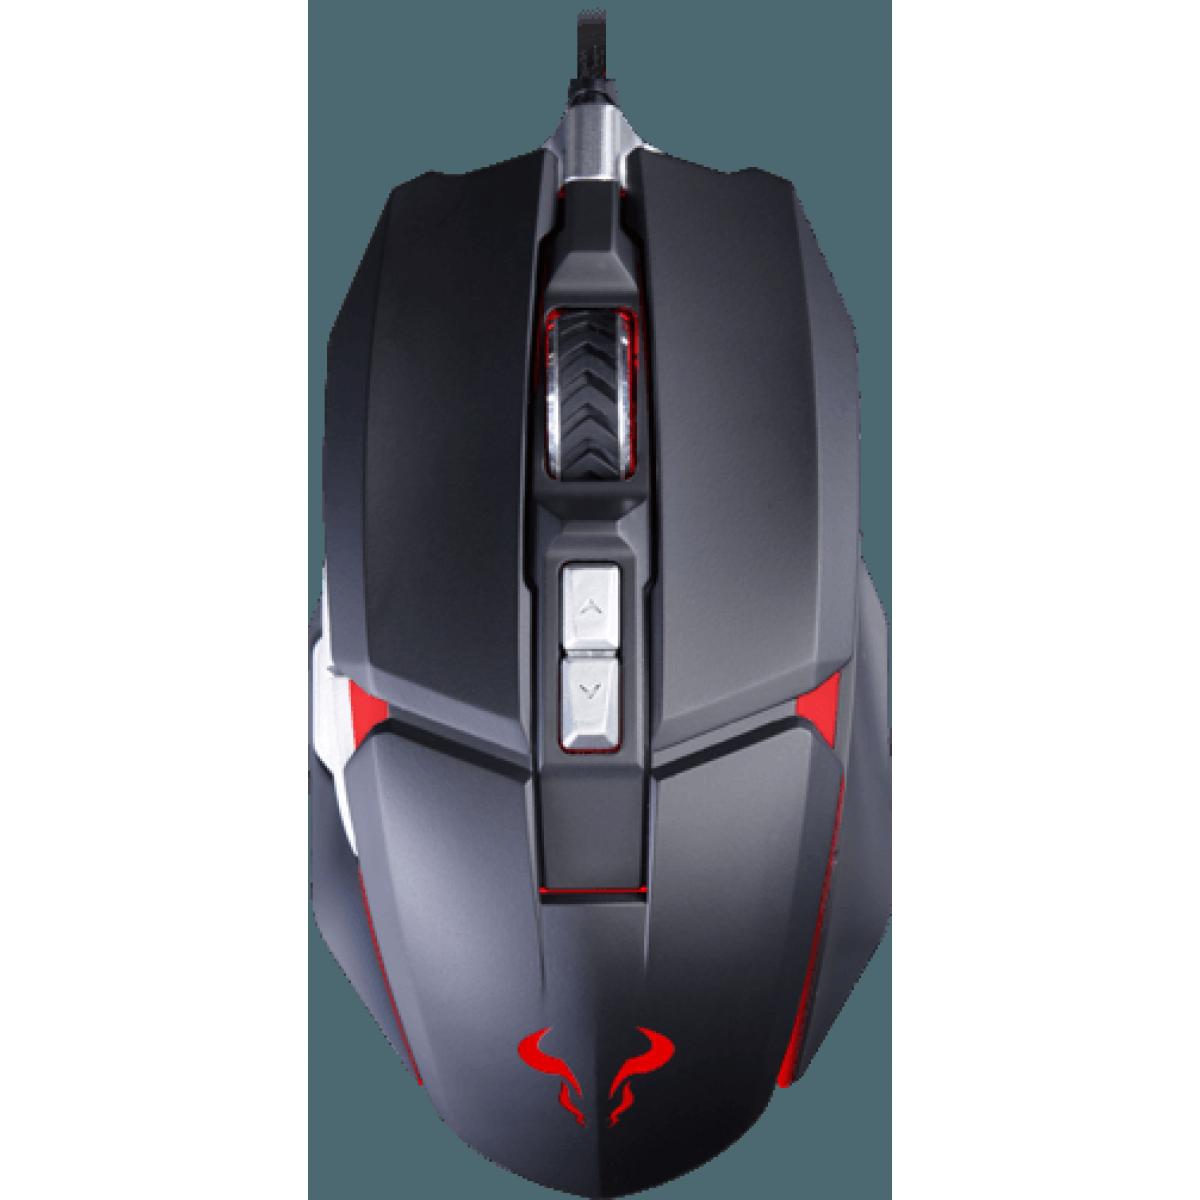 Mouse Gamer Riotoro Aurox, 10000 DPI, 8 Botões Programáveis, Sensor PixArt PWM 3330, Black